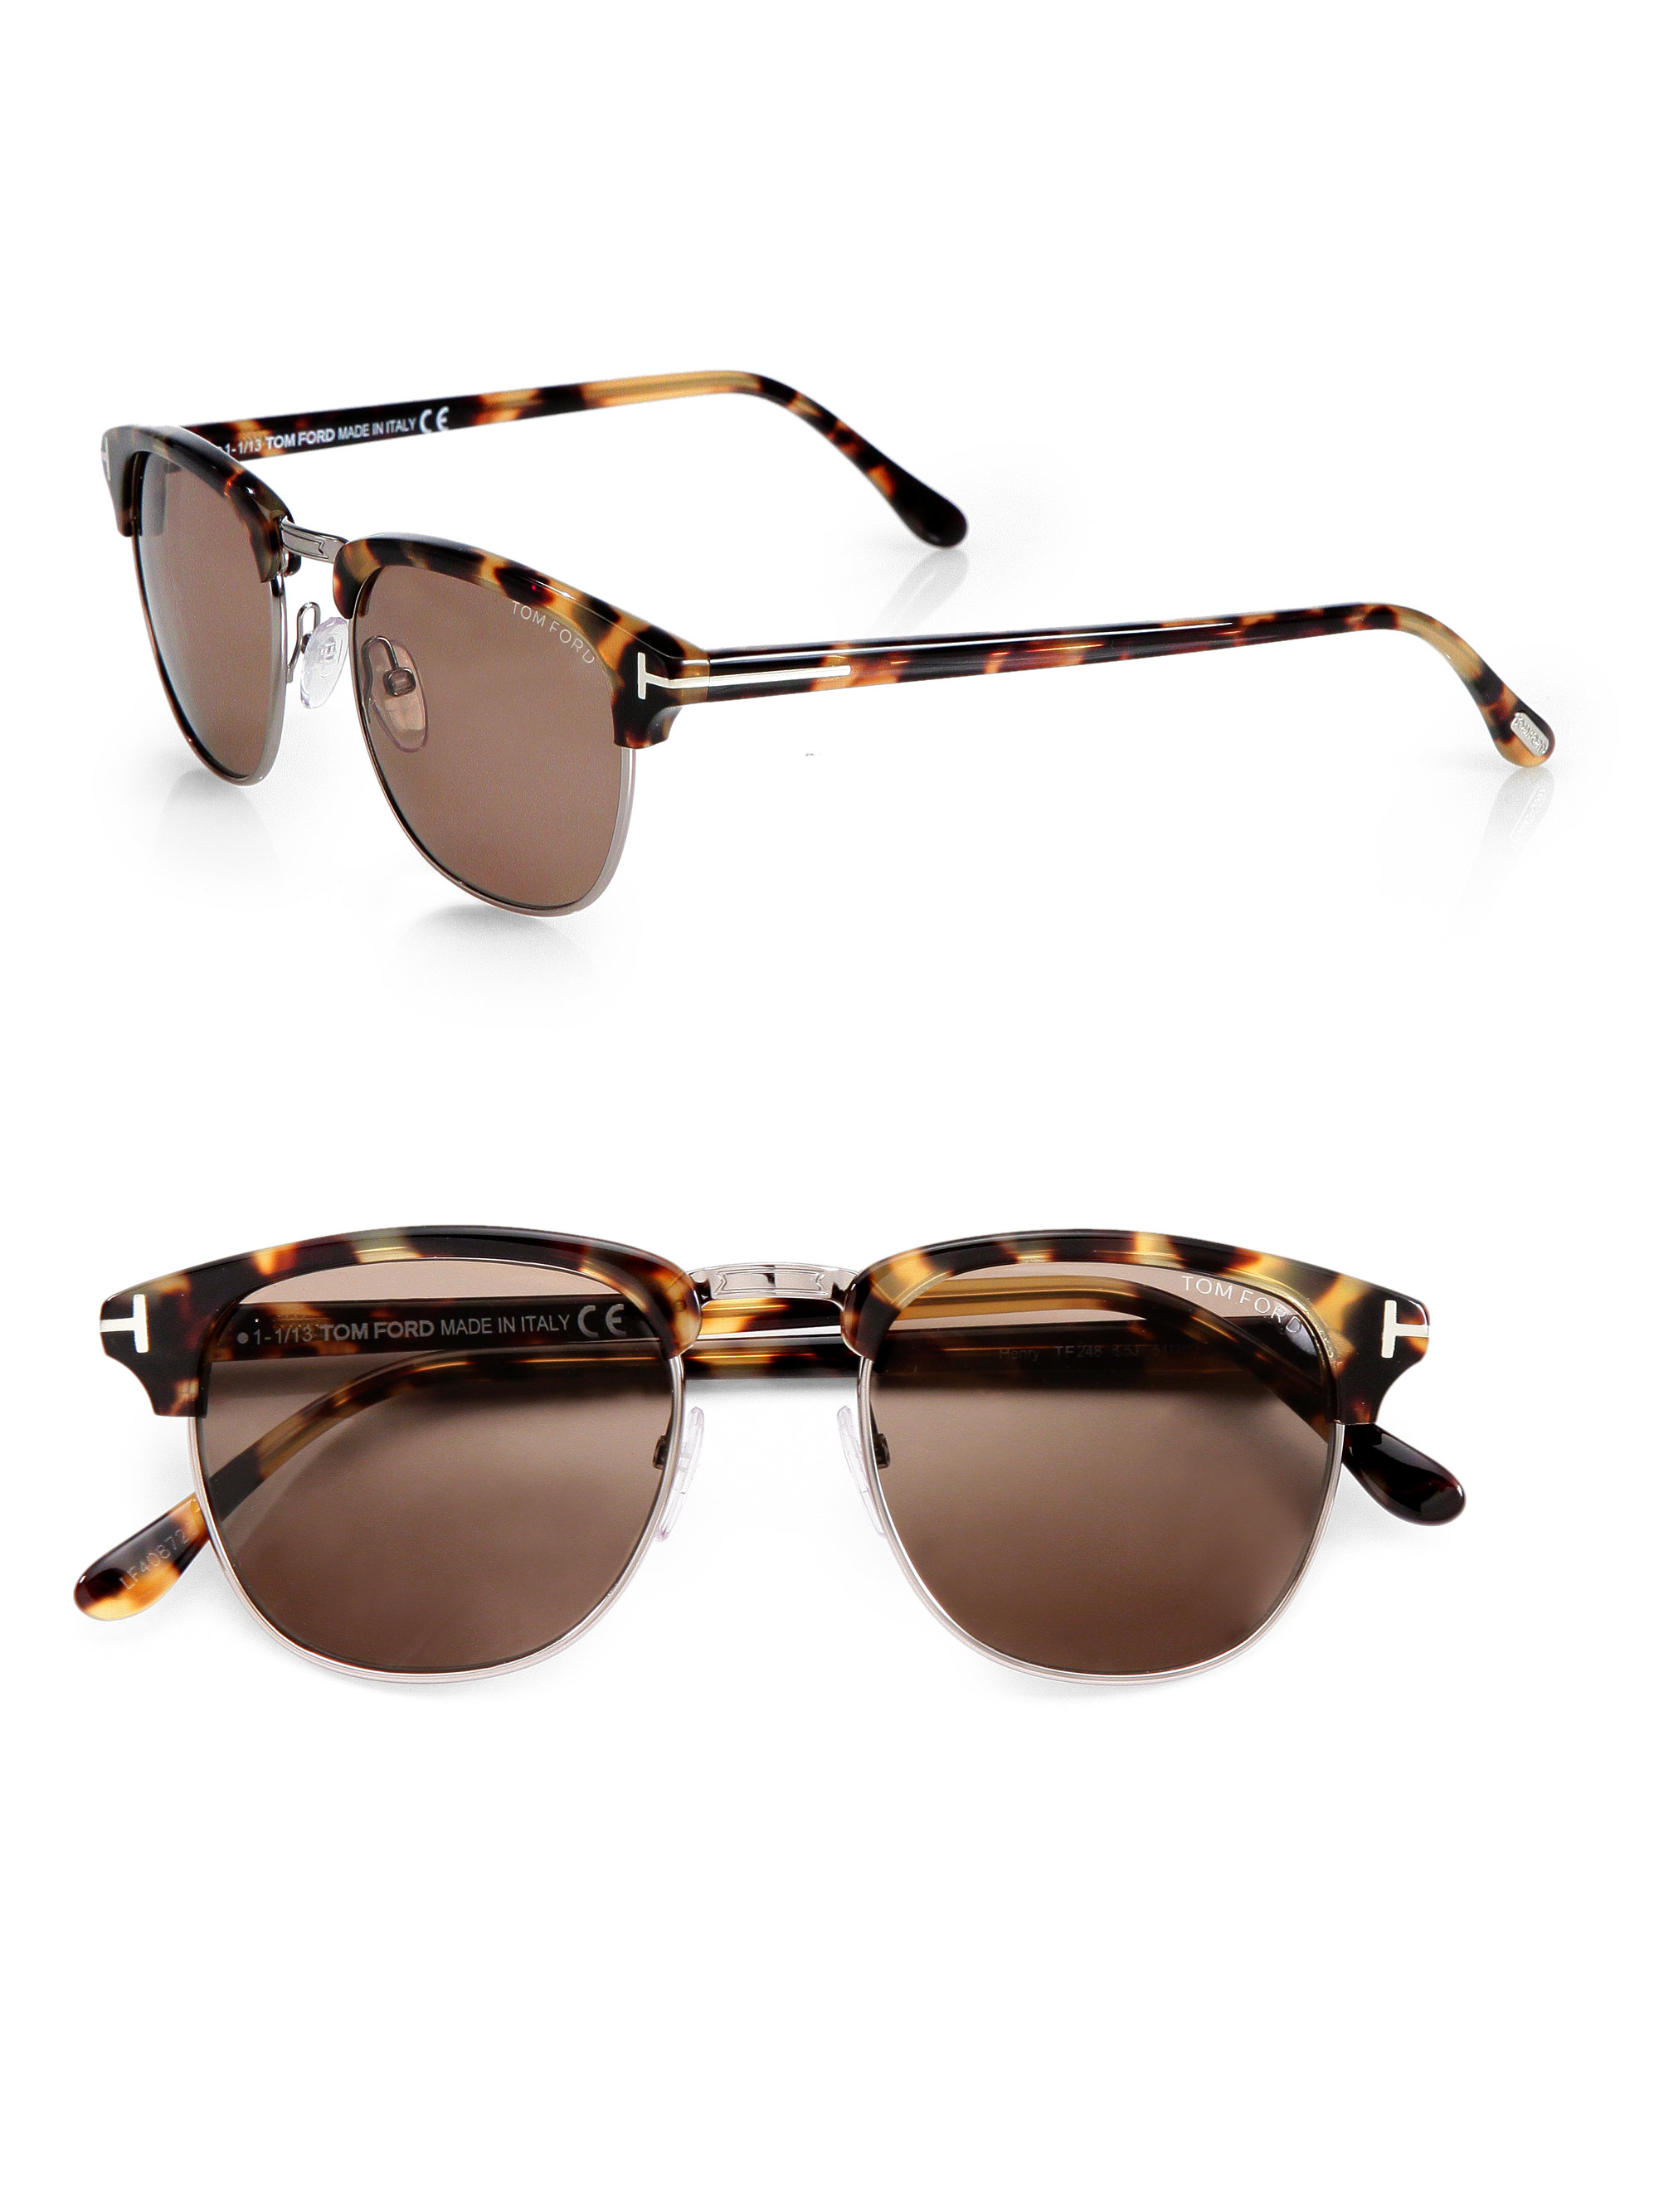 lyst tom ford henry retro sunglasses in brown for men. Black Bedroom Furniture Sets. Home Design Ideas